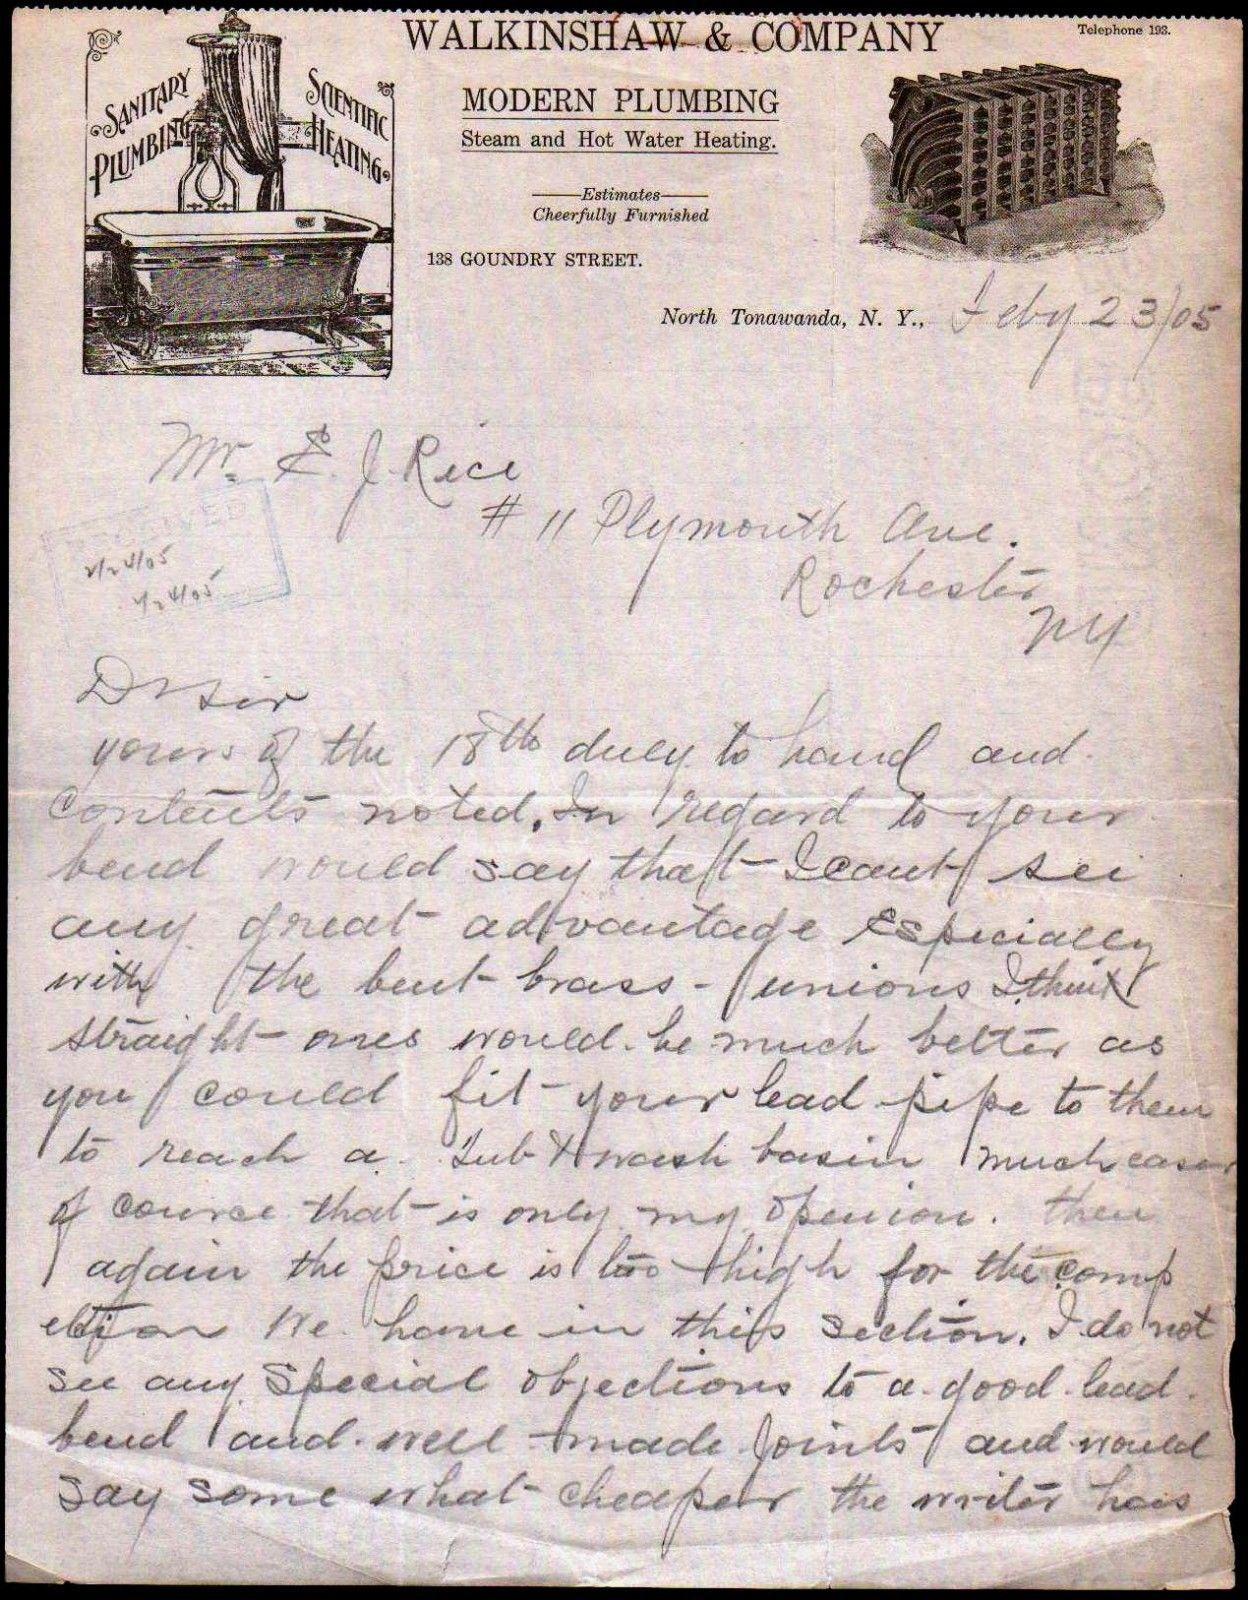 Walkinshaw and Co Modern Plumbing, 138 Goundry, North Tonawanda, illustrated letterhead (1905-02-23).jpg